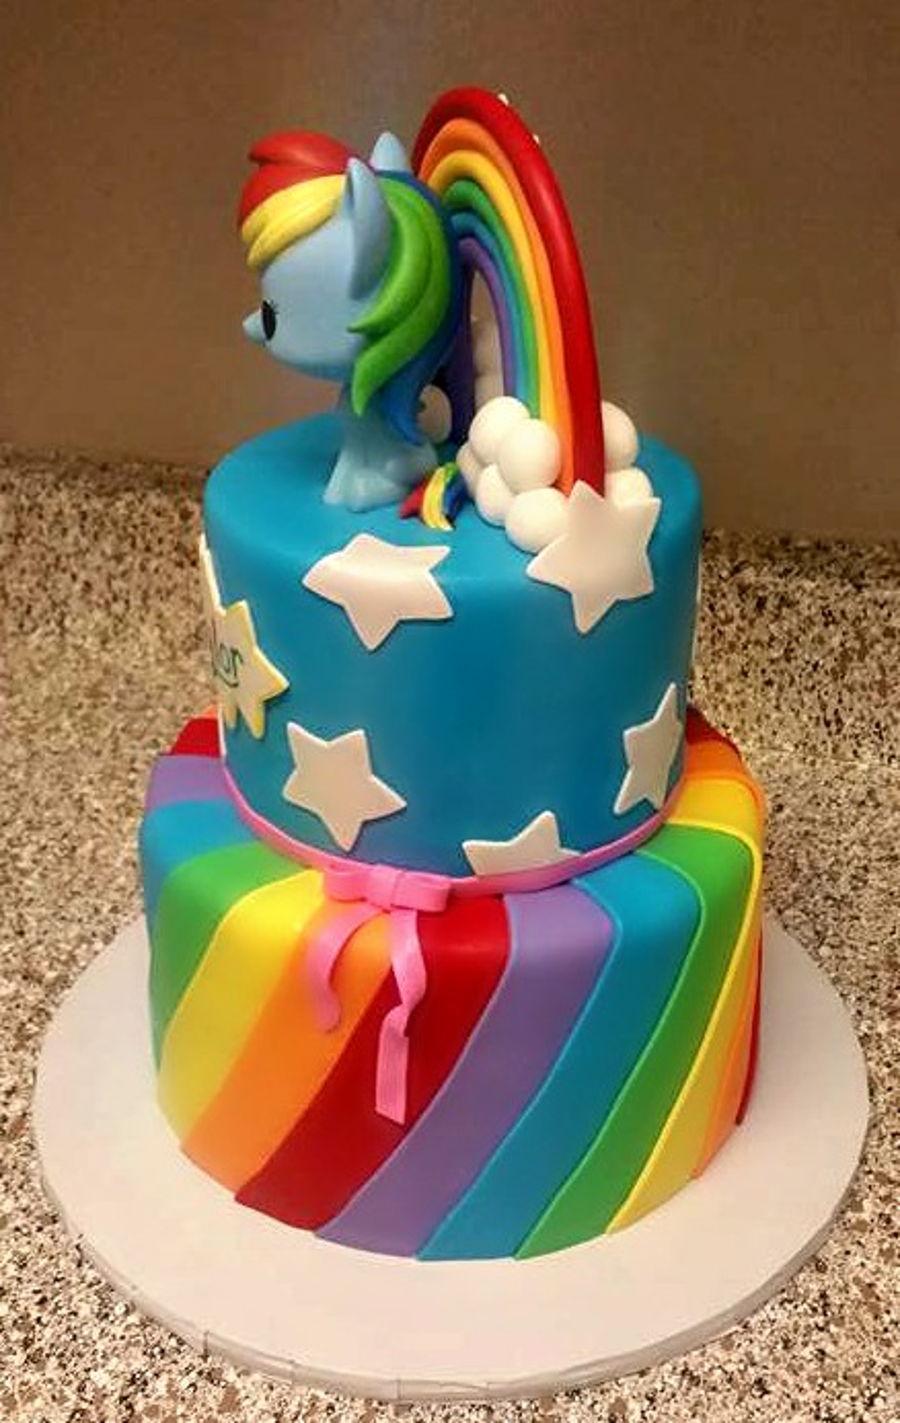 Top My Cake